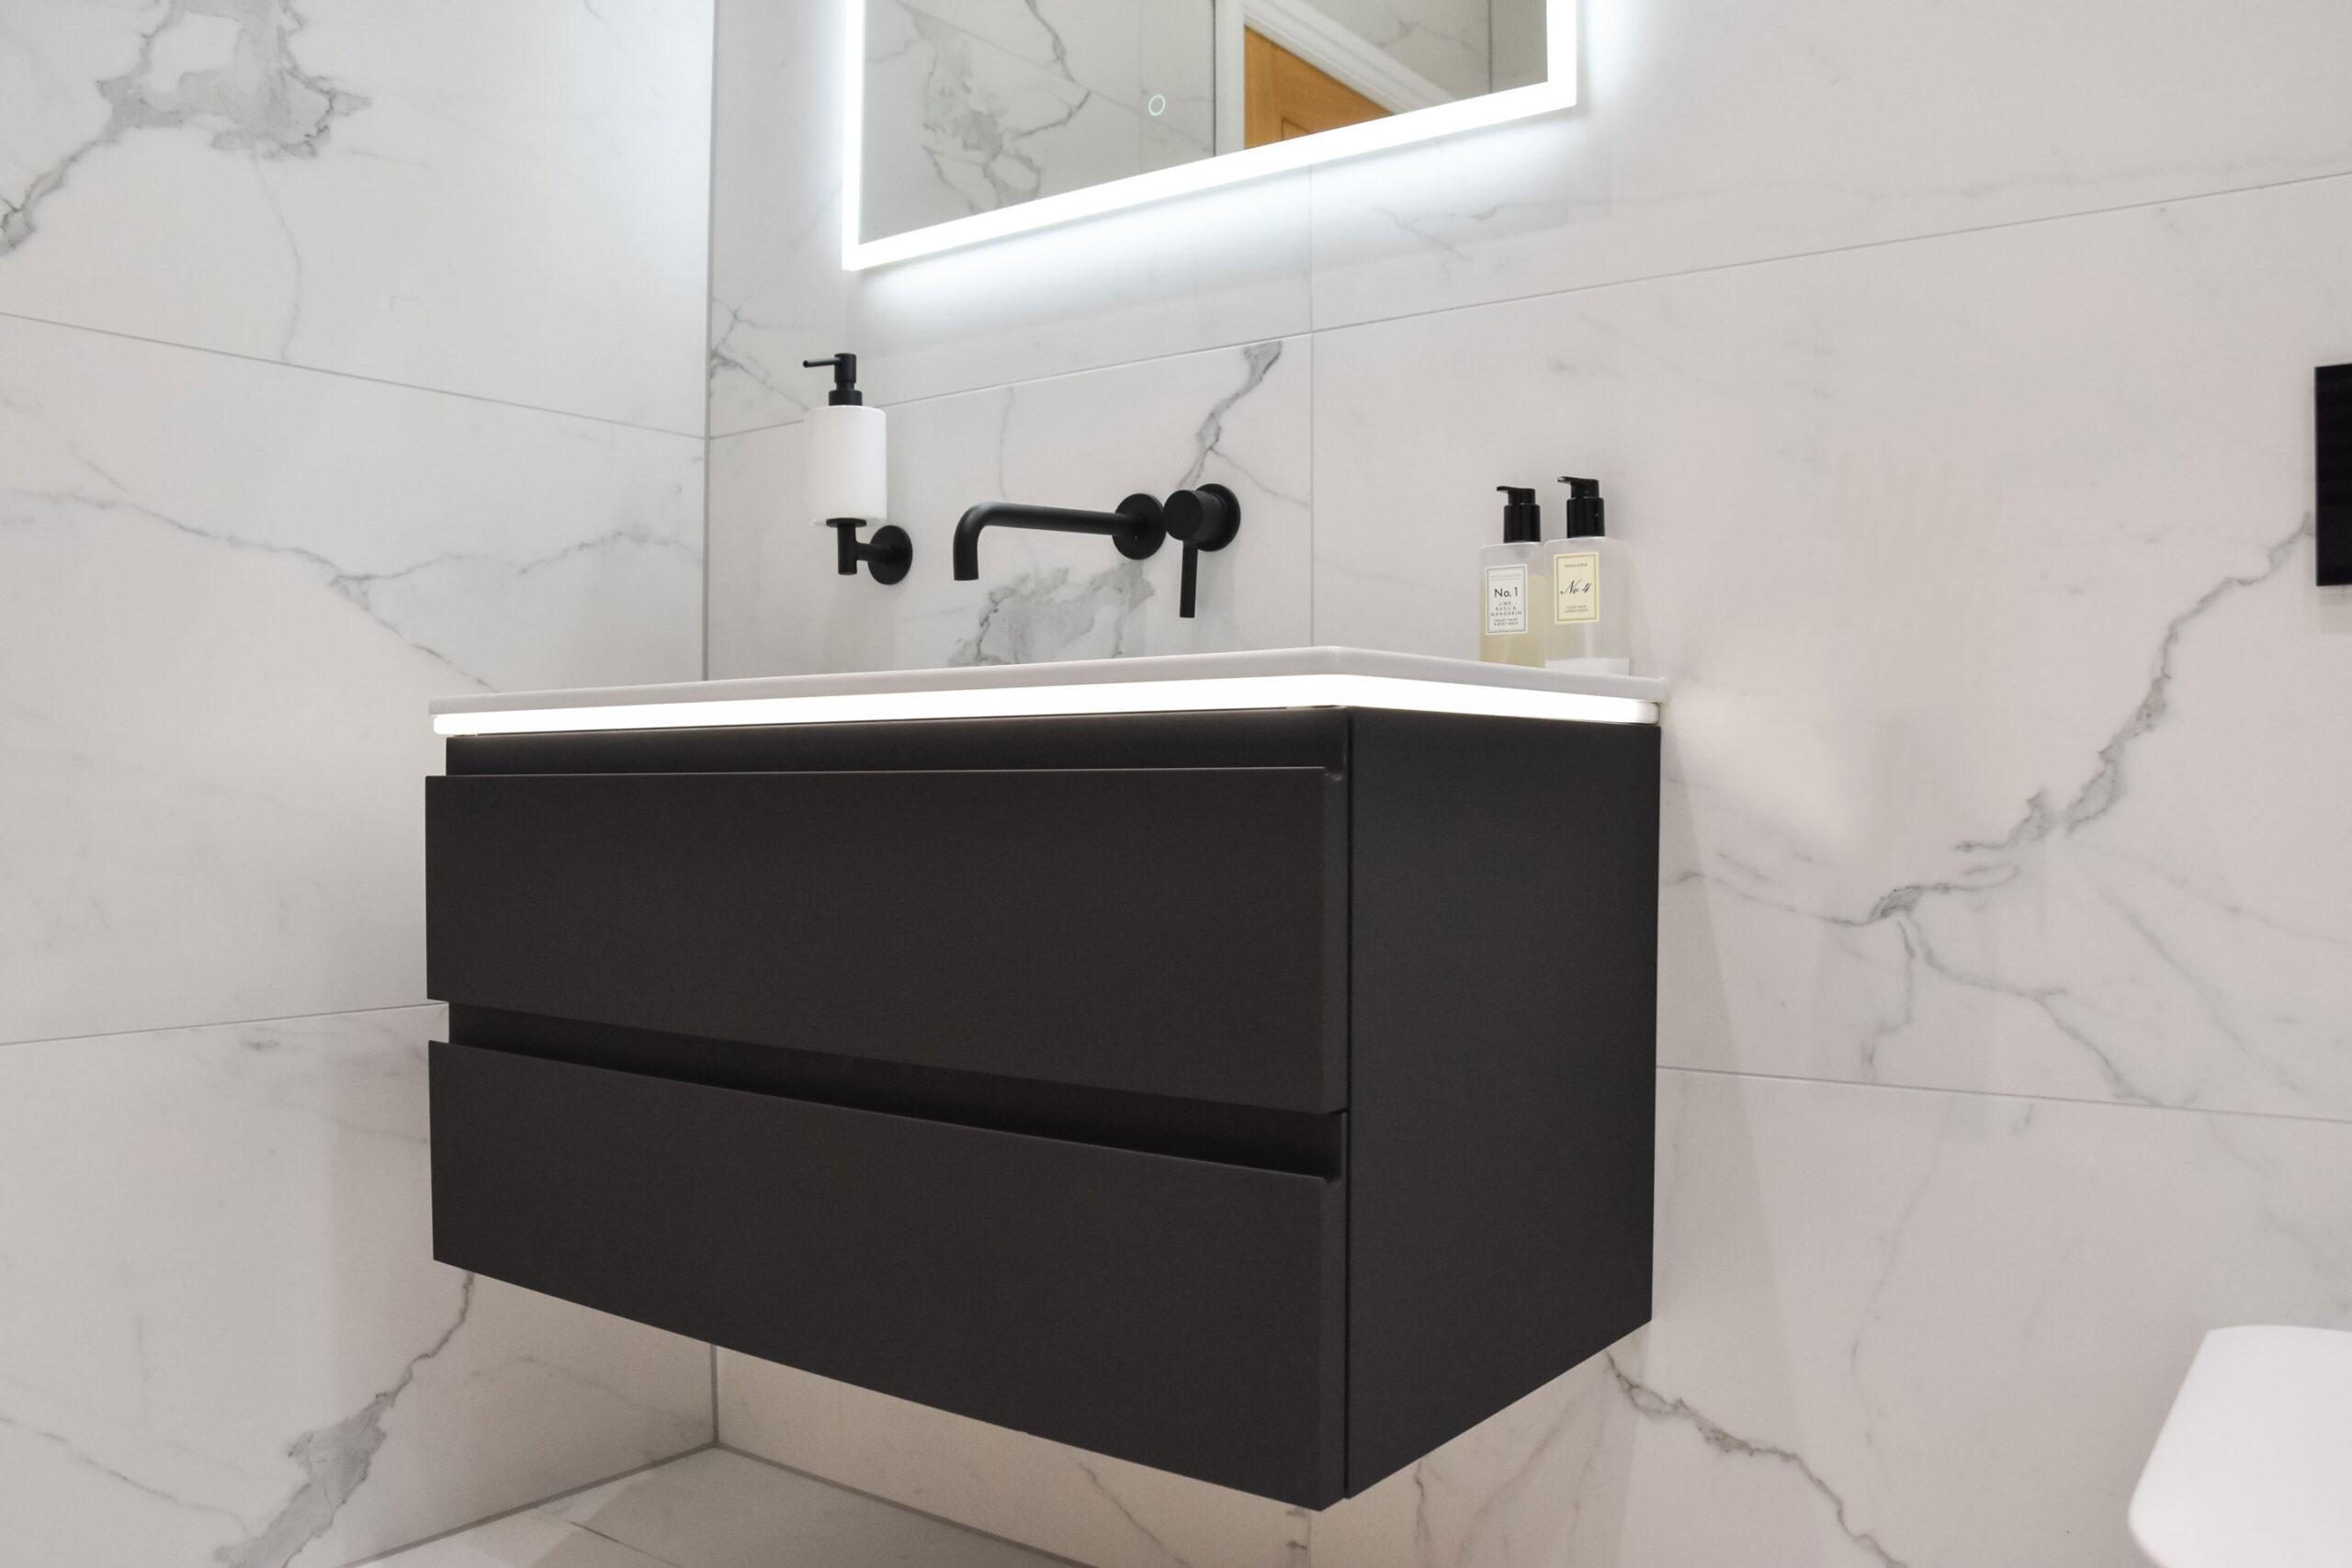 reduced horizontal image from garth & julies bathroom